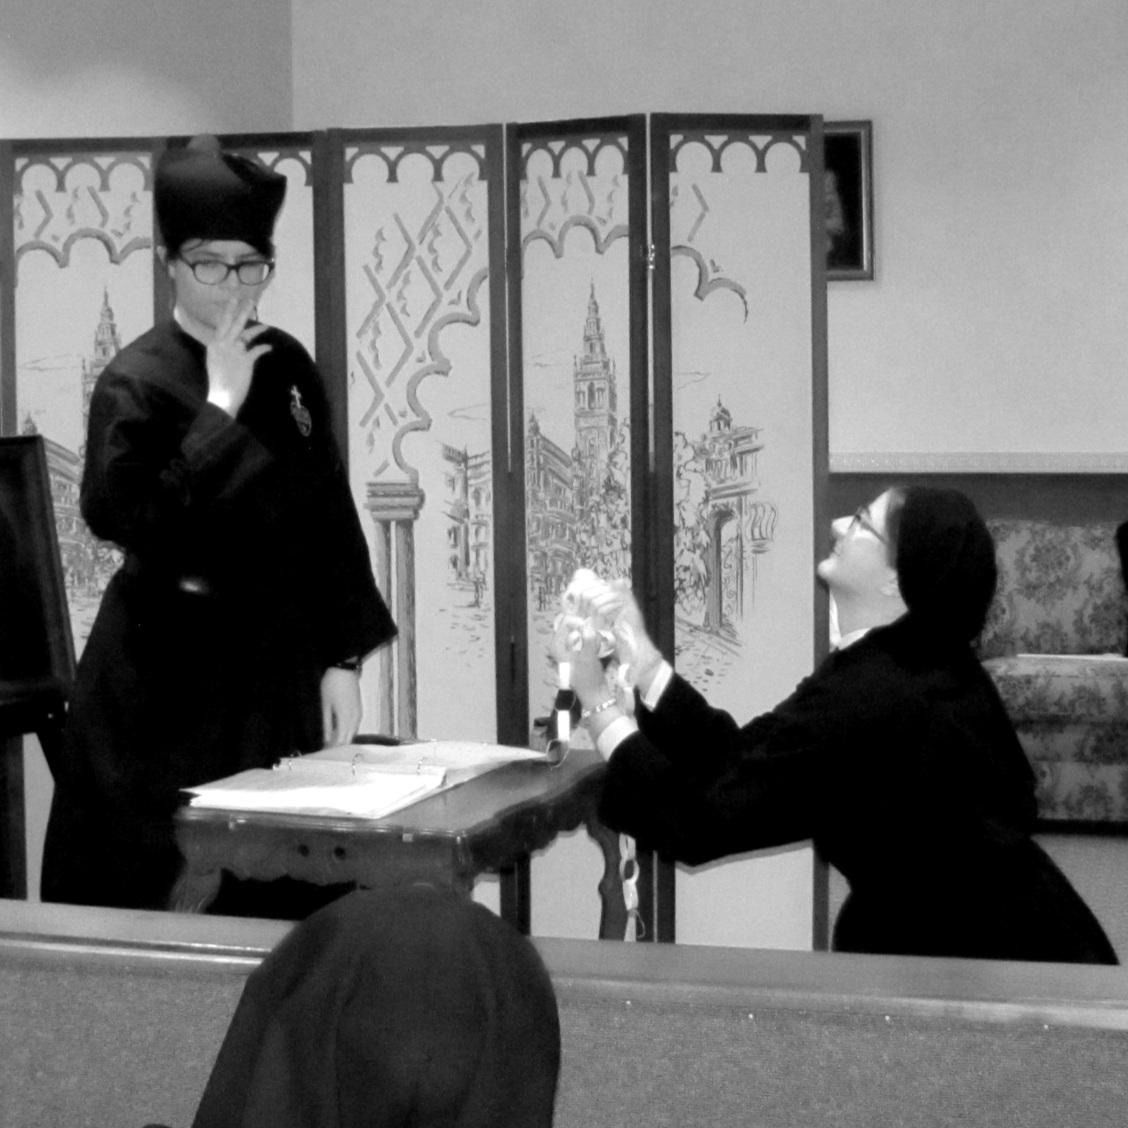 …Fr. Norbert refuses.  Gabriel insists.  Fr. Norbert reconsiders...